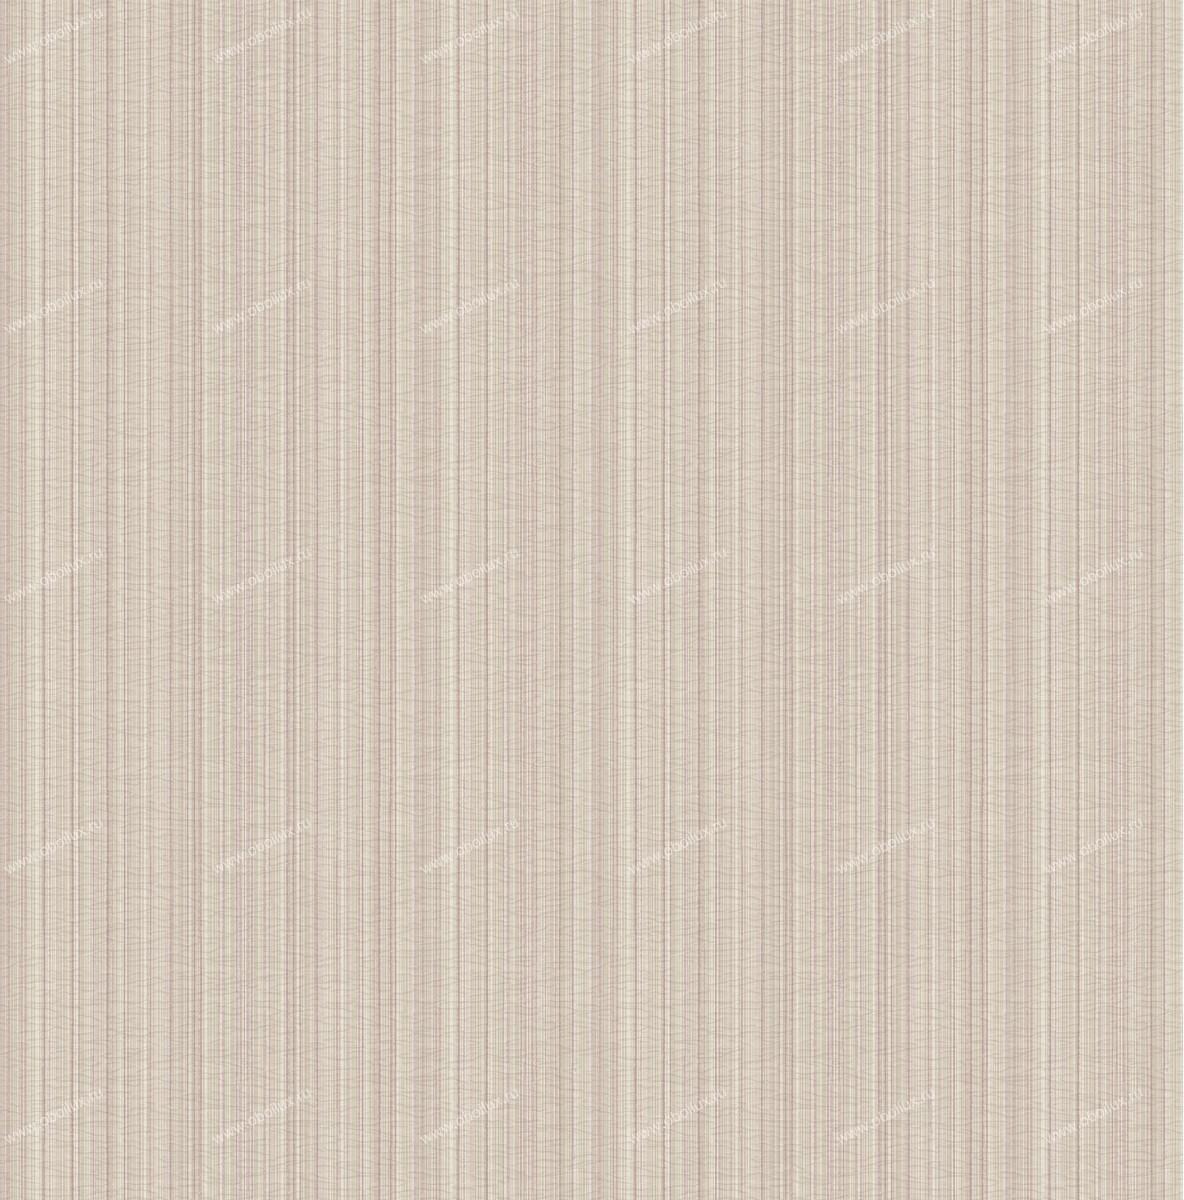 Американские обои Fresco,  коллекция Brava, артикул5918843